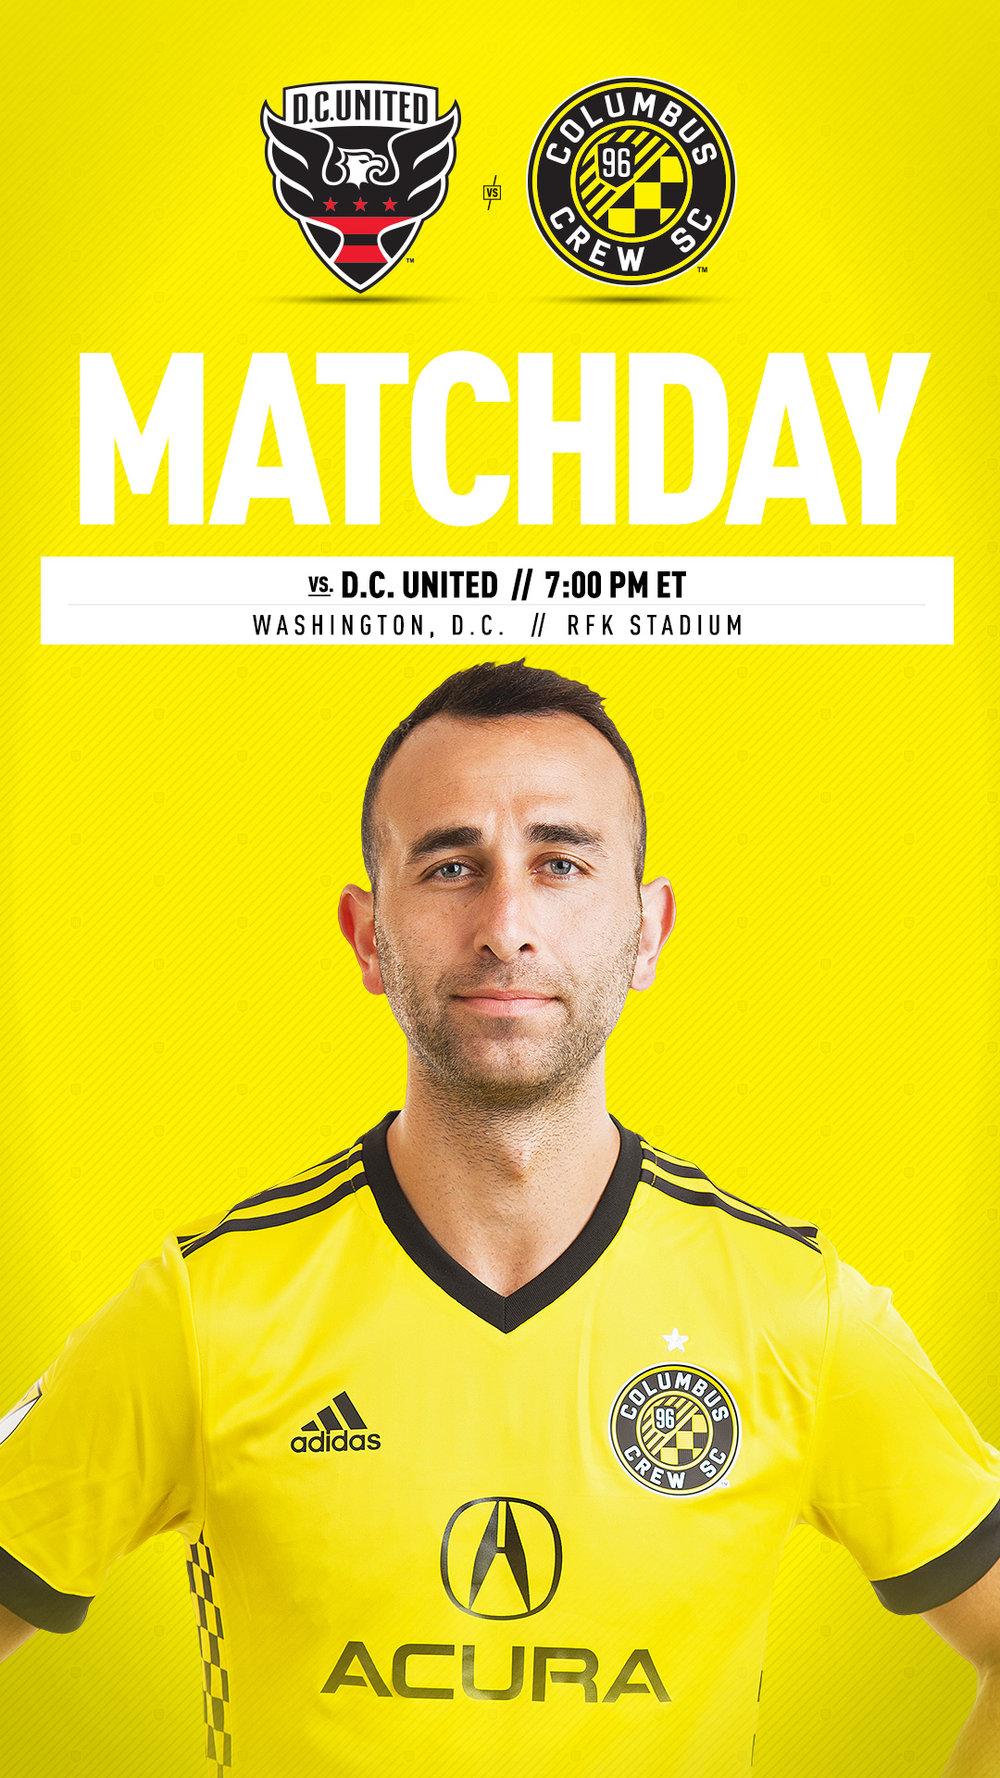 VERT_Matchday.jpg